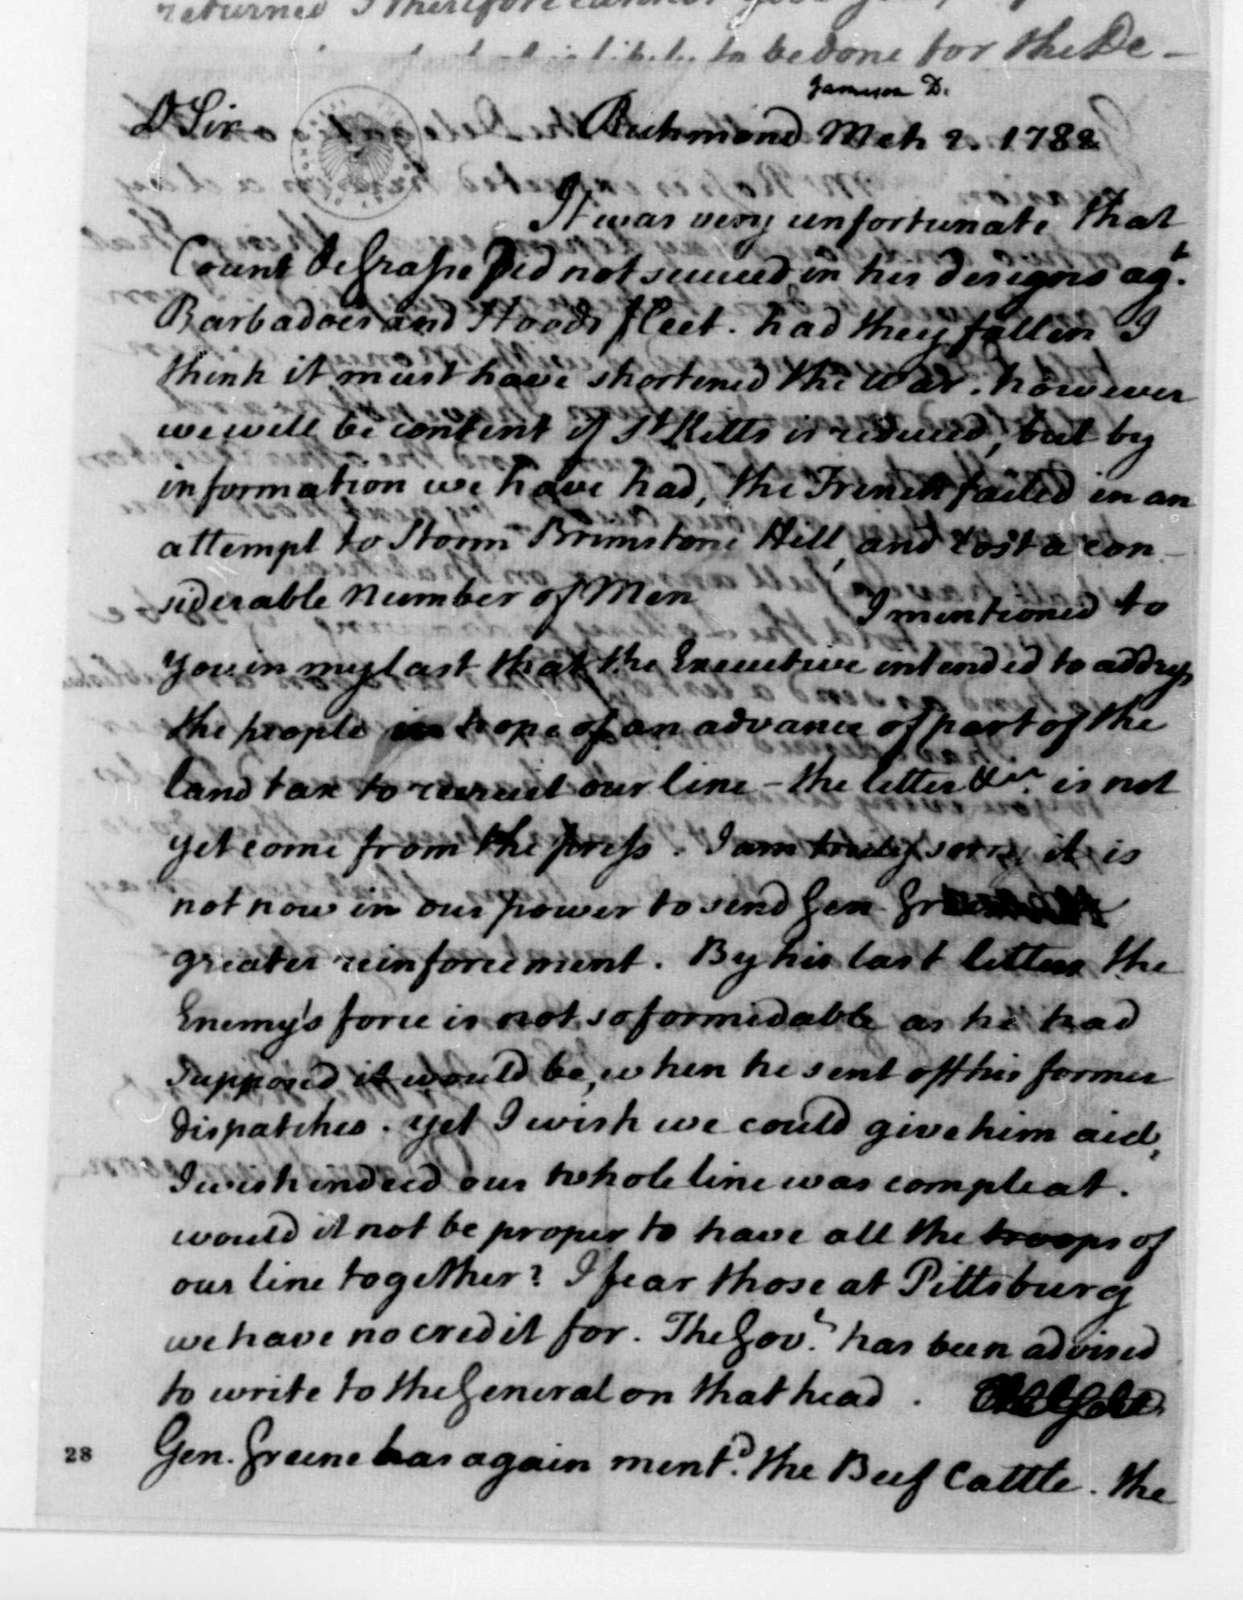 David Jameson to James Madison, March 2, 1782.